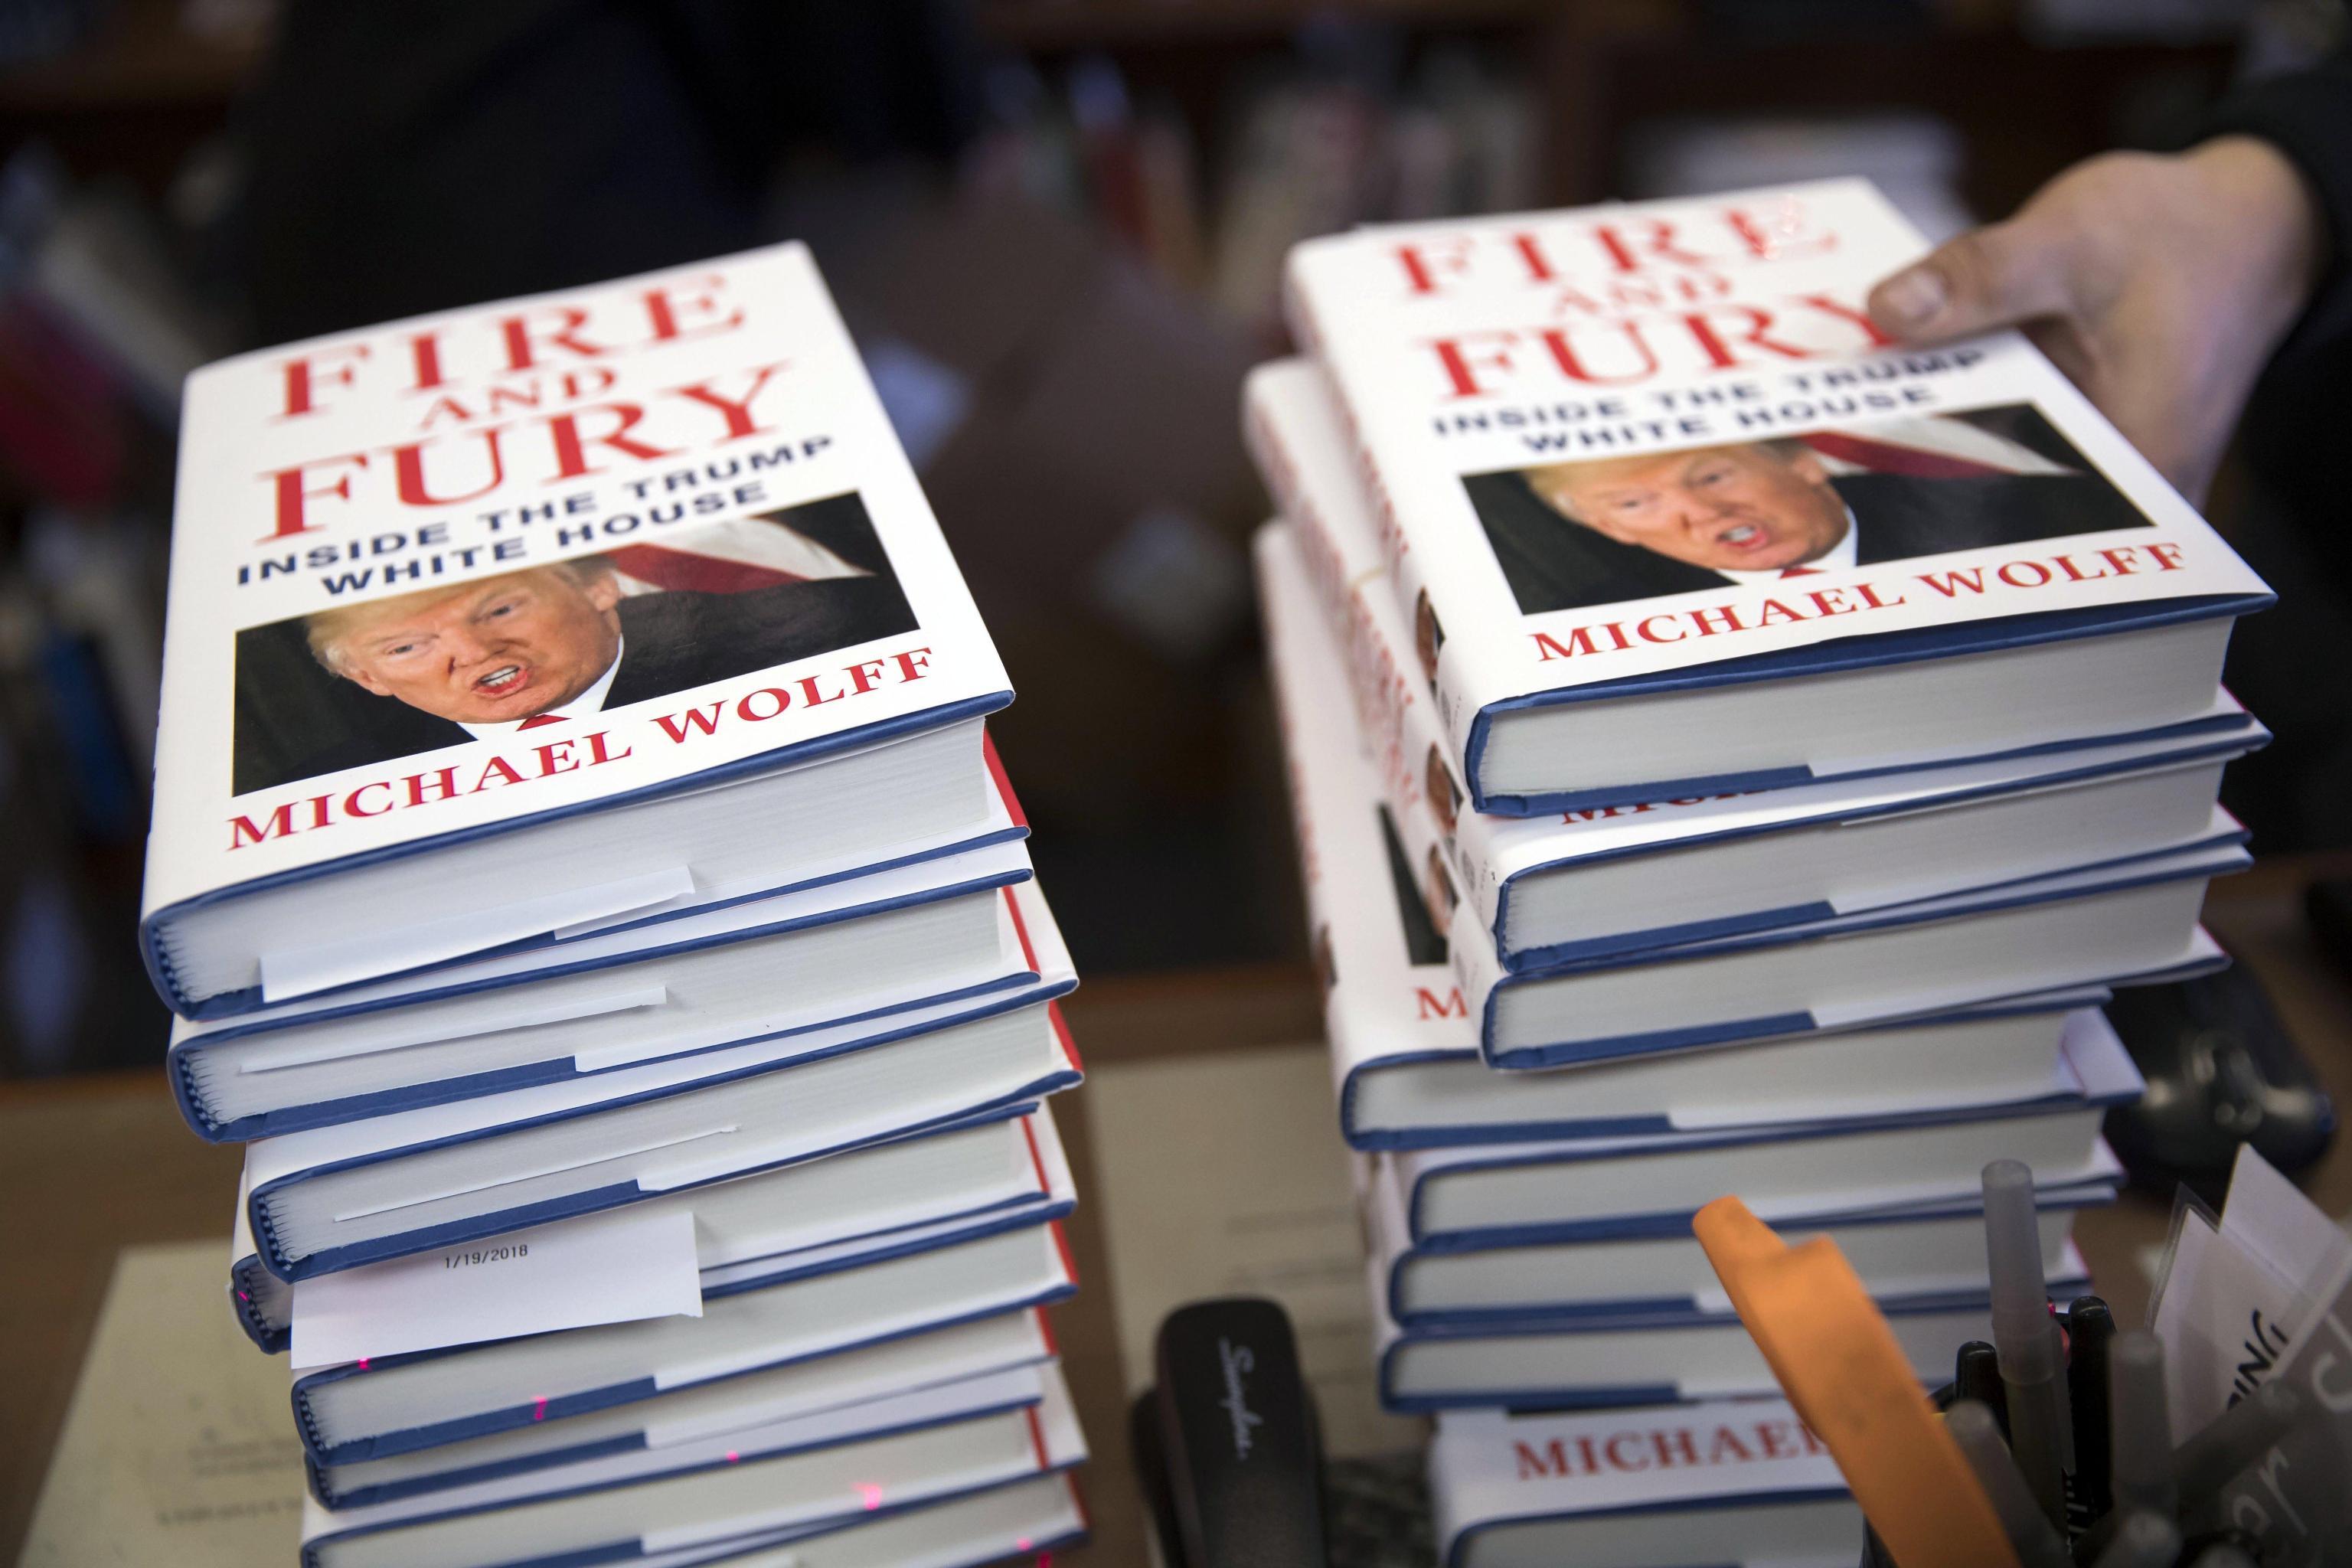 Comico su libro Wolff, copia a Mueller